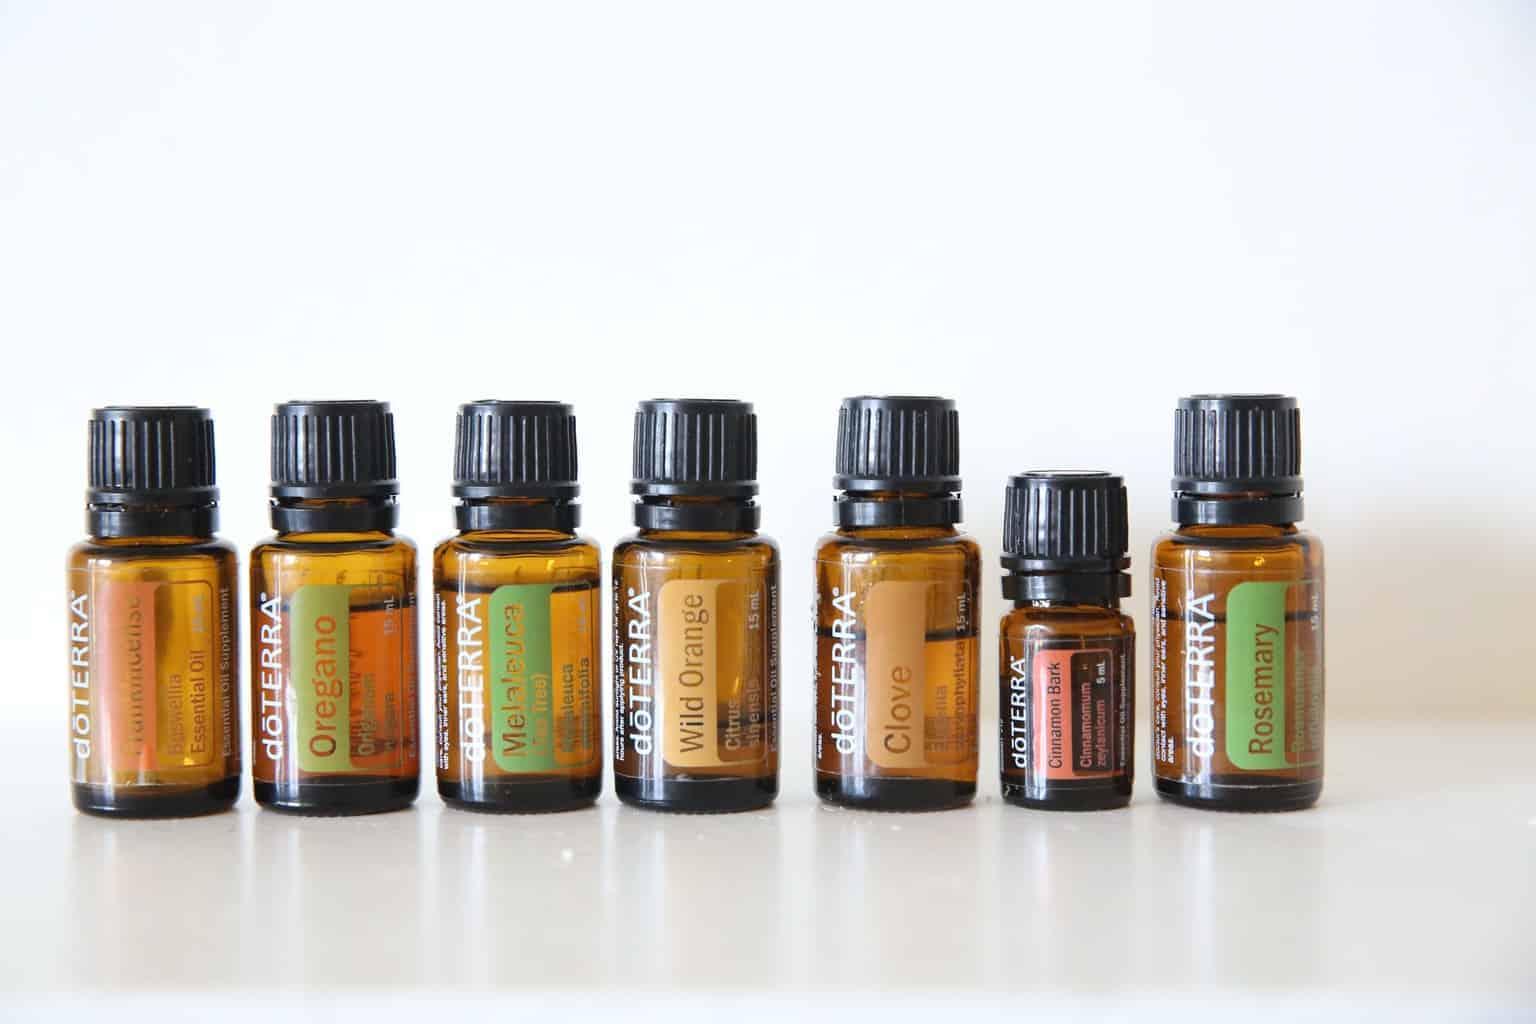 doterra's immune boosting essential oils.